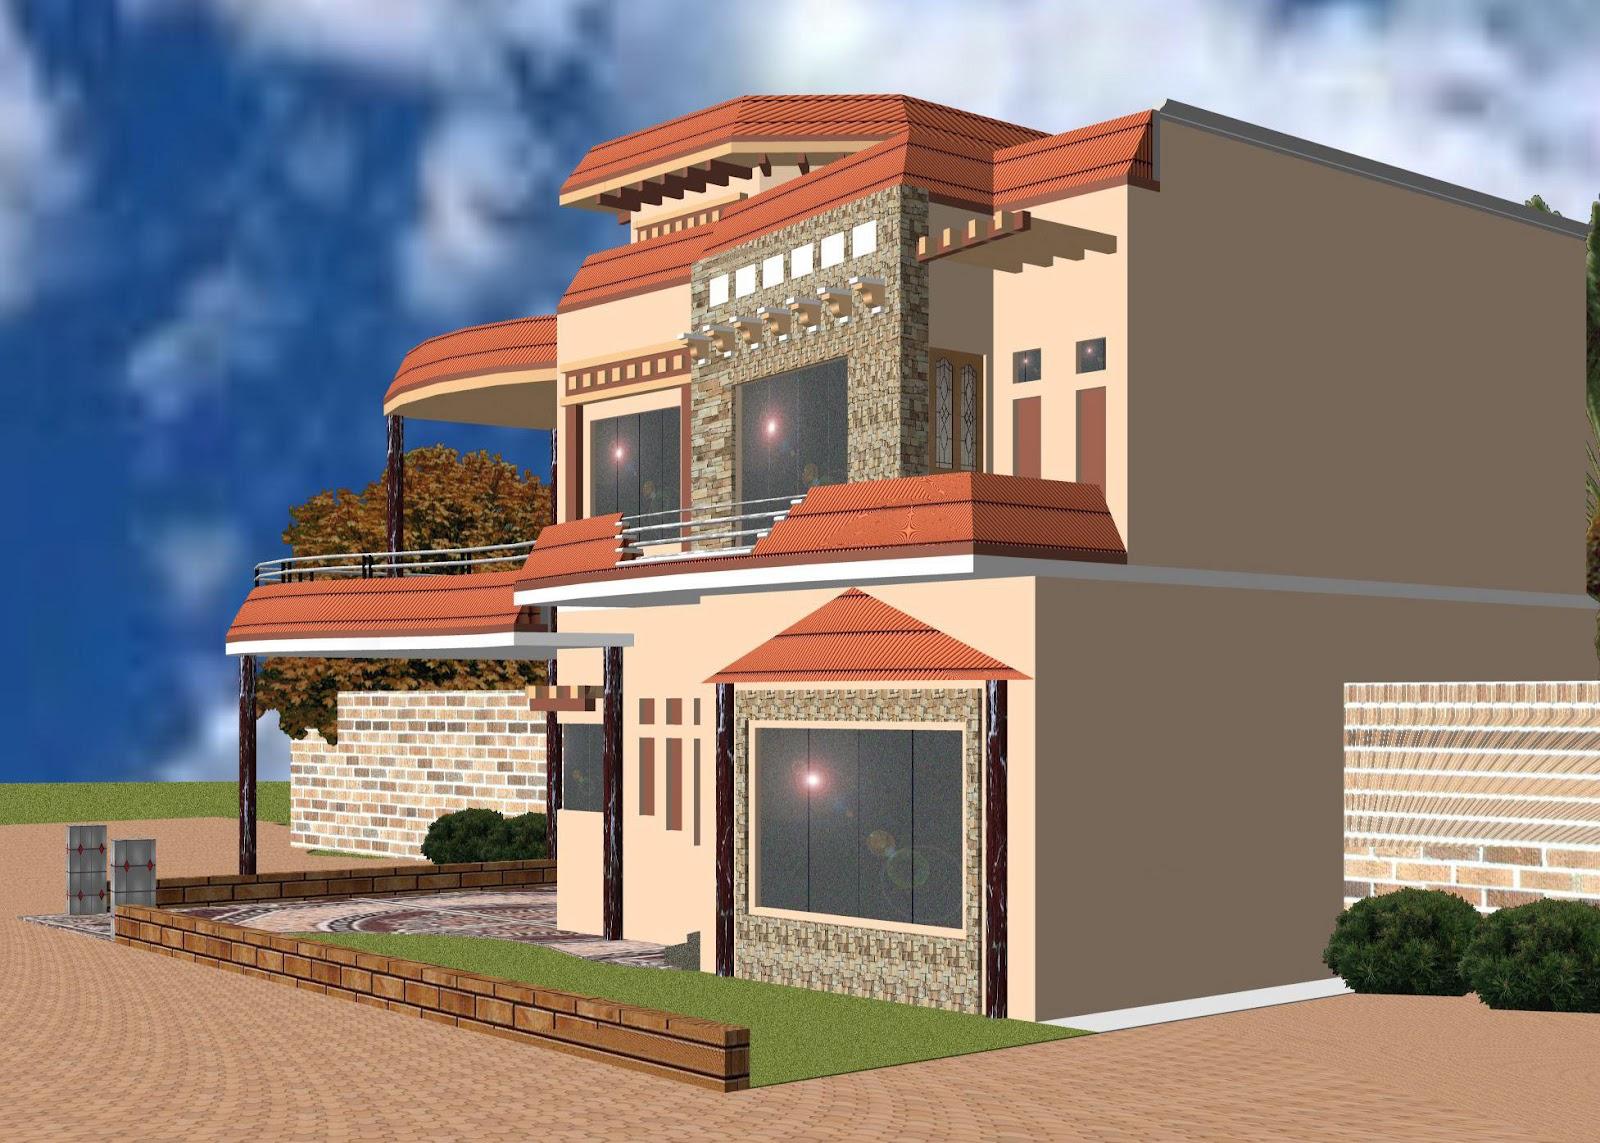 Front Elevation Paint : Paint on front elevation in pakistan joy studio design